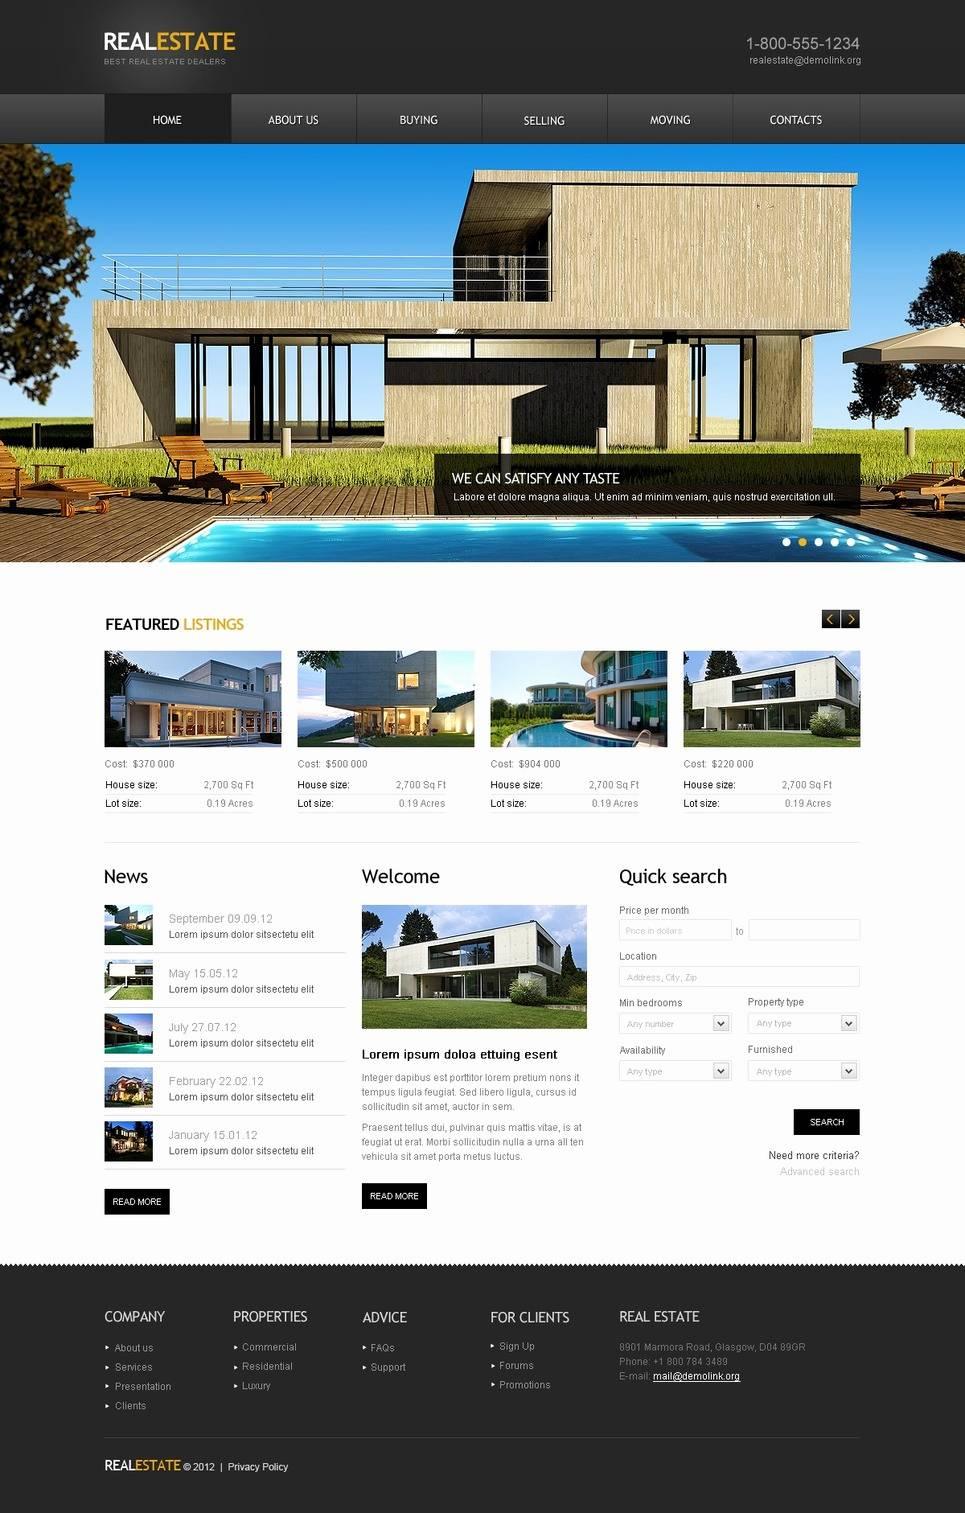 Realtor Websites Templates